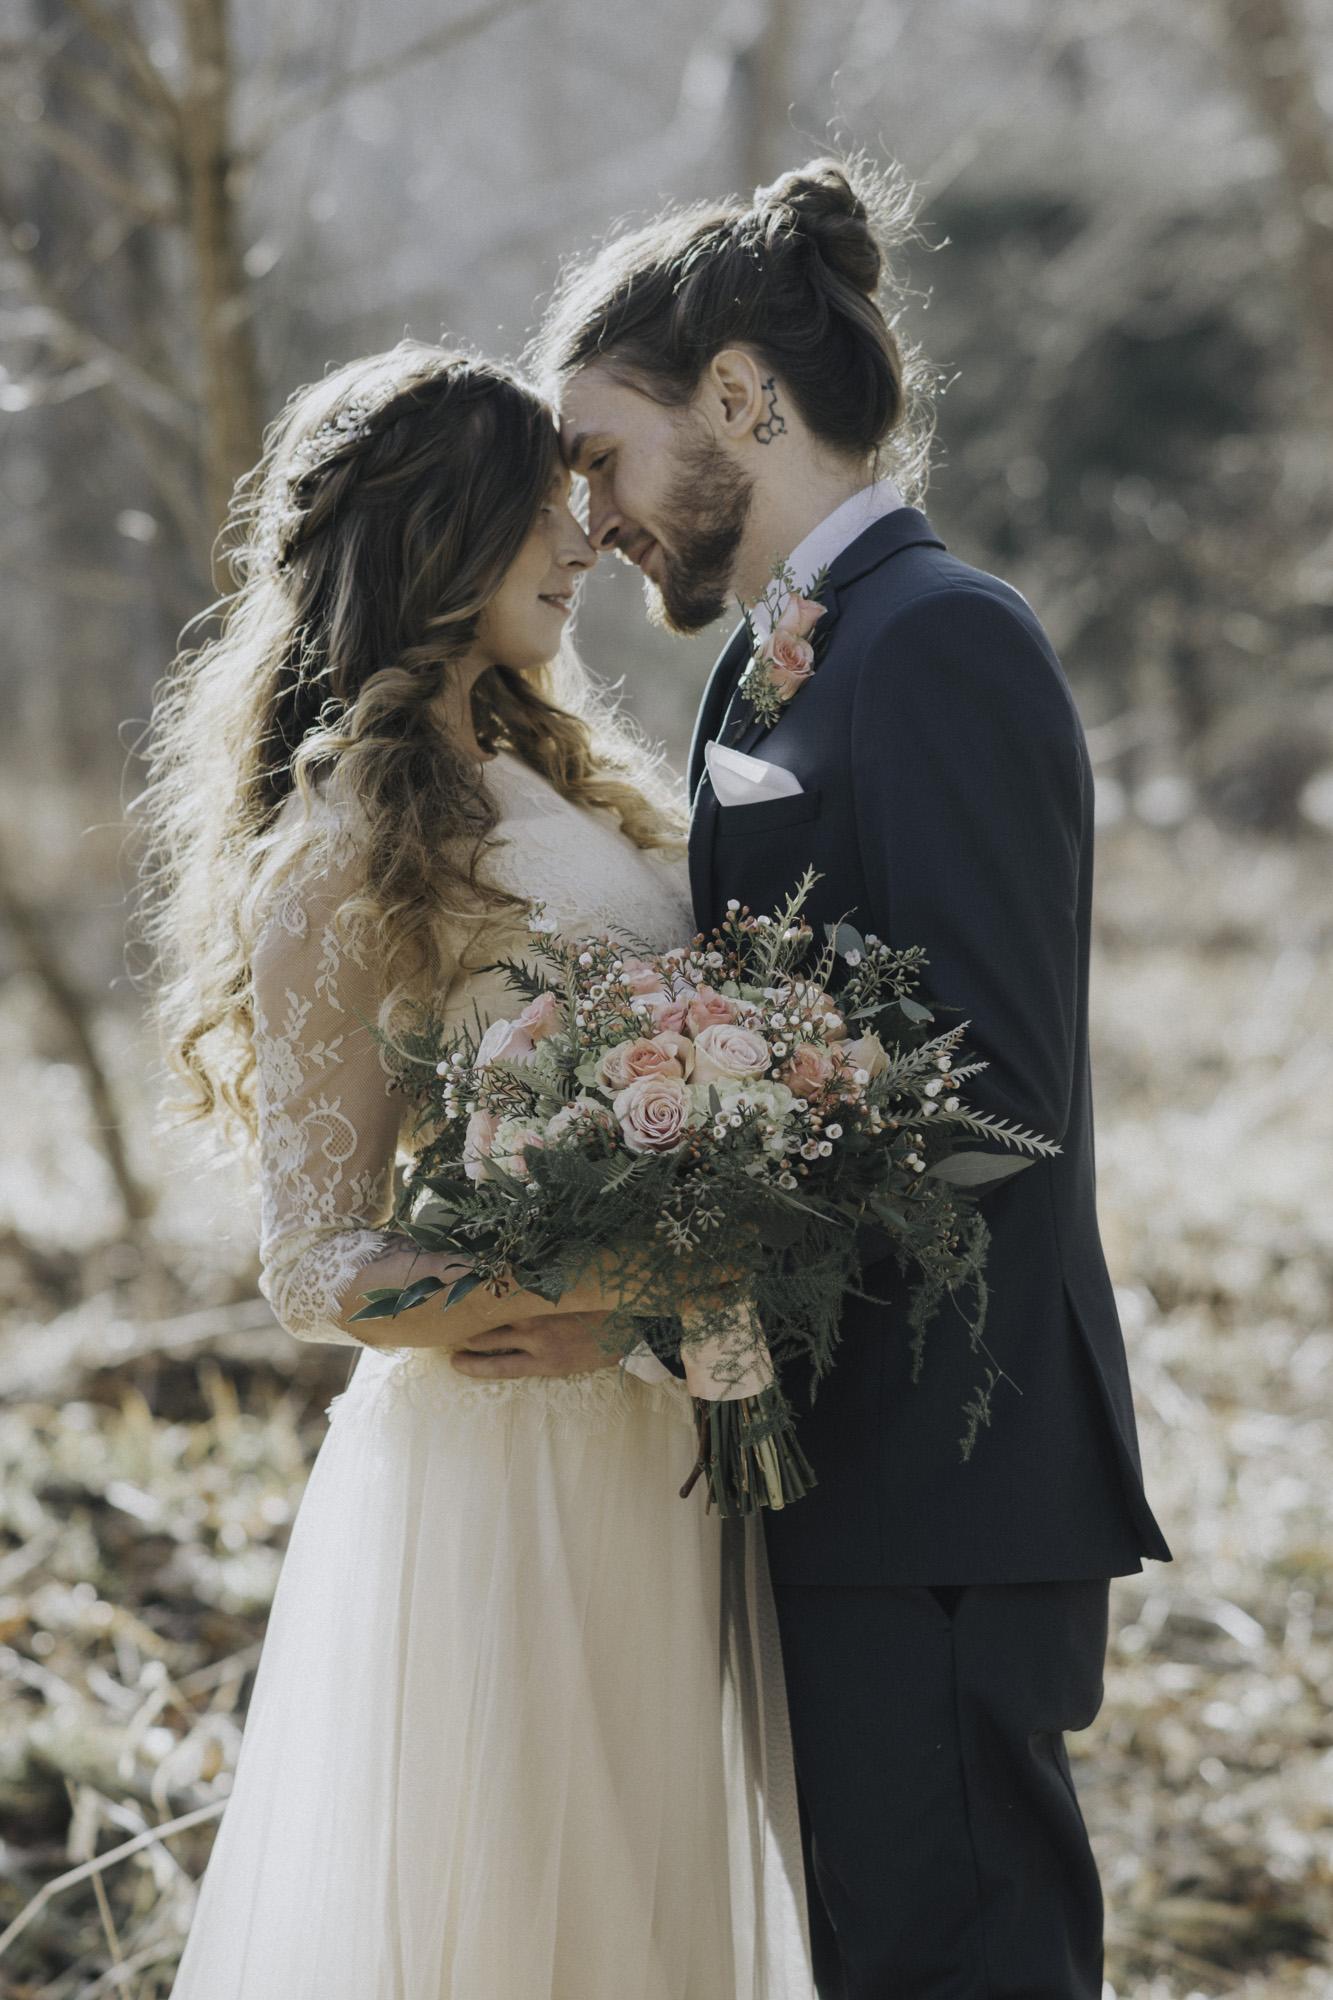 Cate_Ann_Photography_Dayton_Ohio_Wedding_Elopement_And_Engagement_PhotographerDSC_5810.jpg